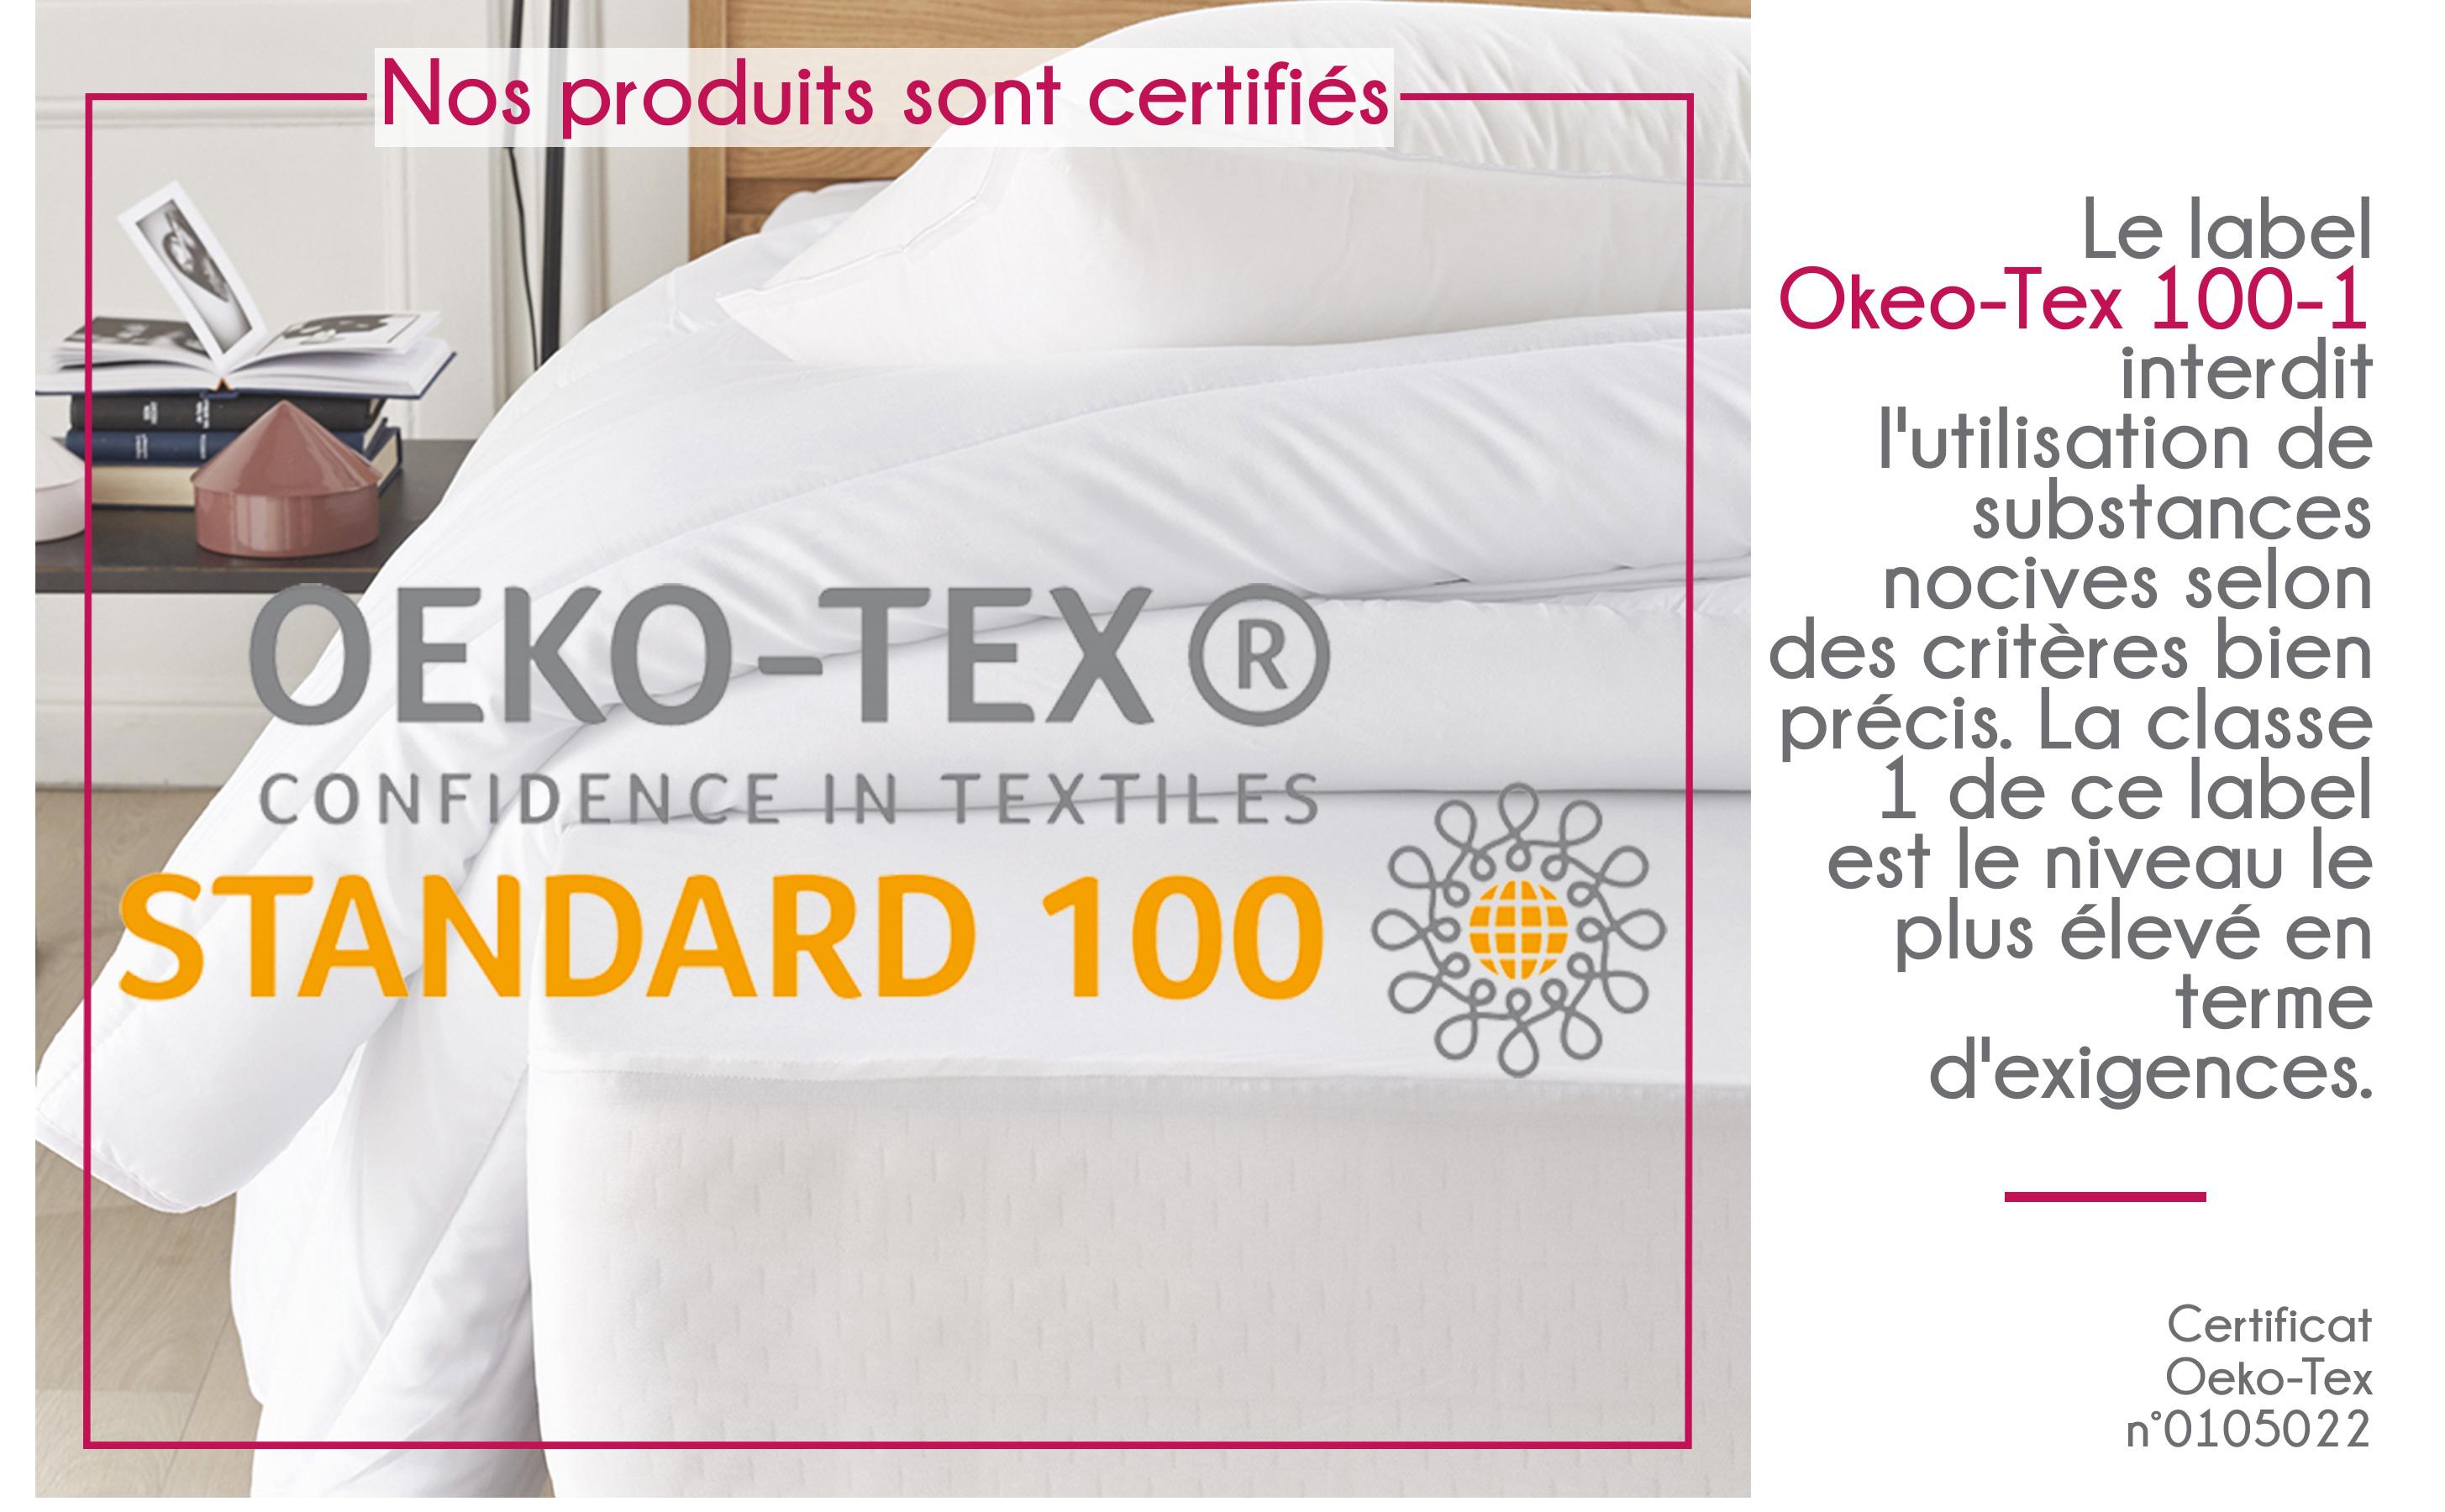 certifié oekotex